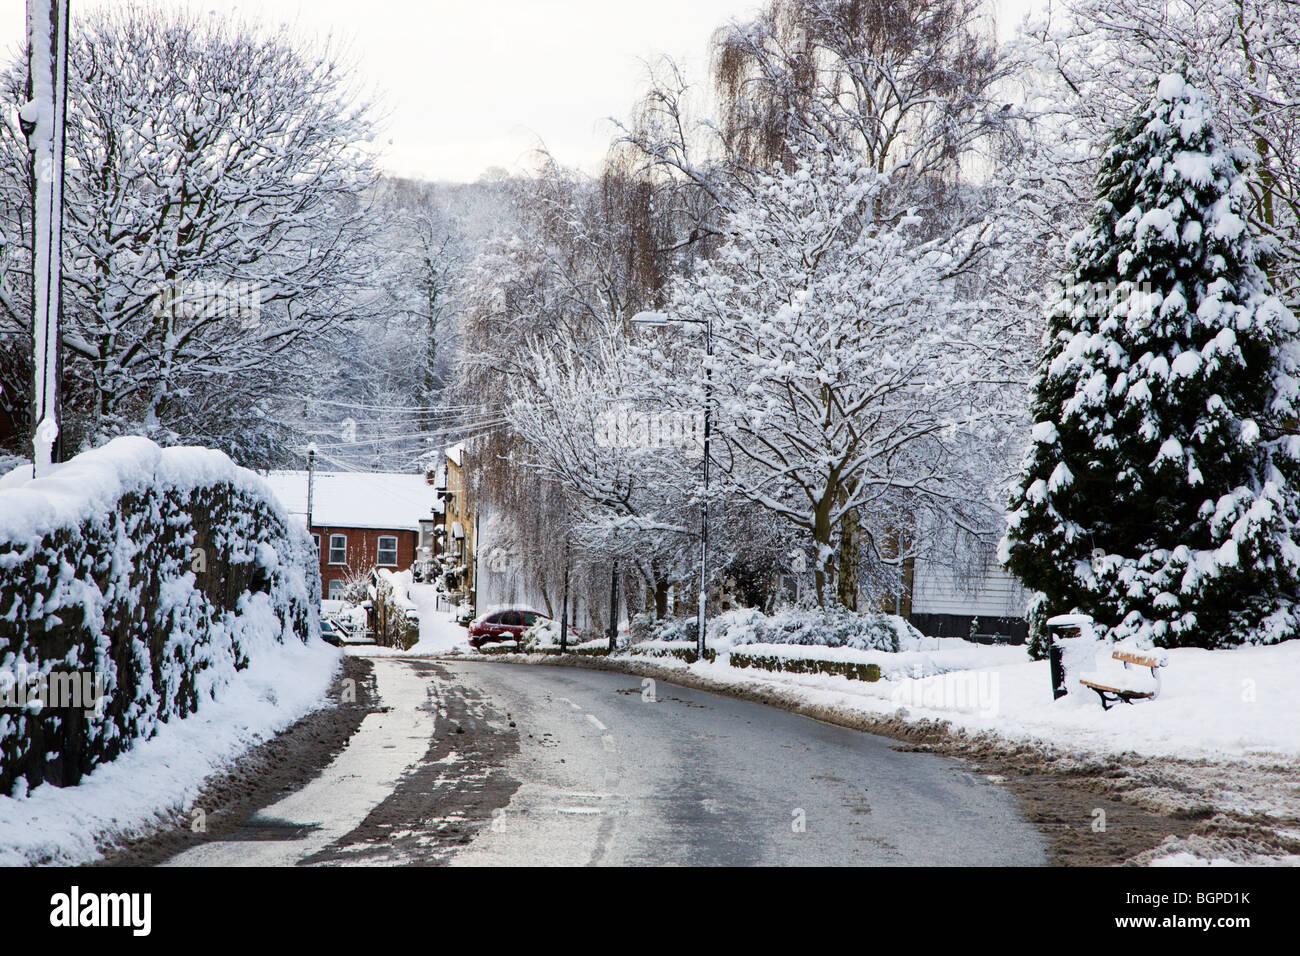 Deserted road after heavy snow Knaresborough North Yorkshire England - Stock Image